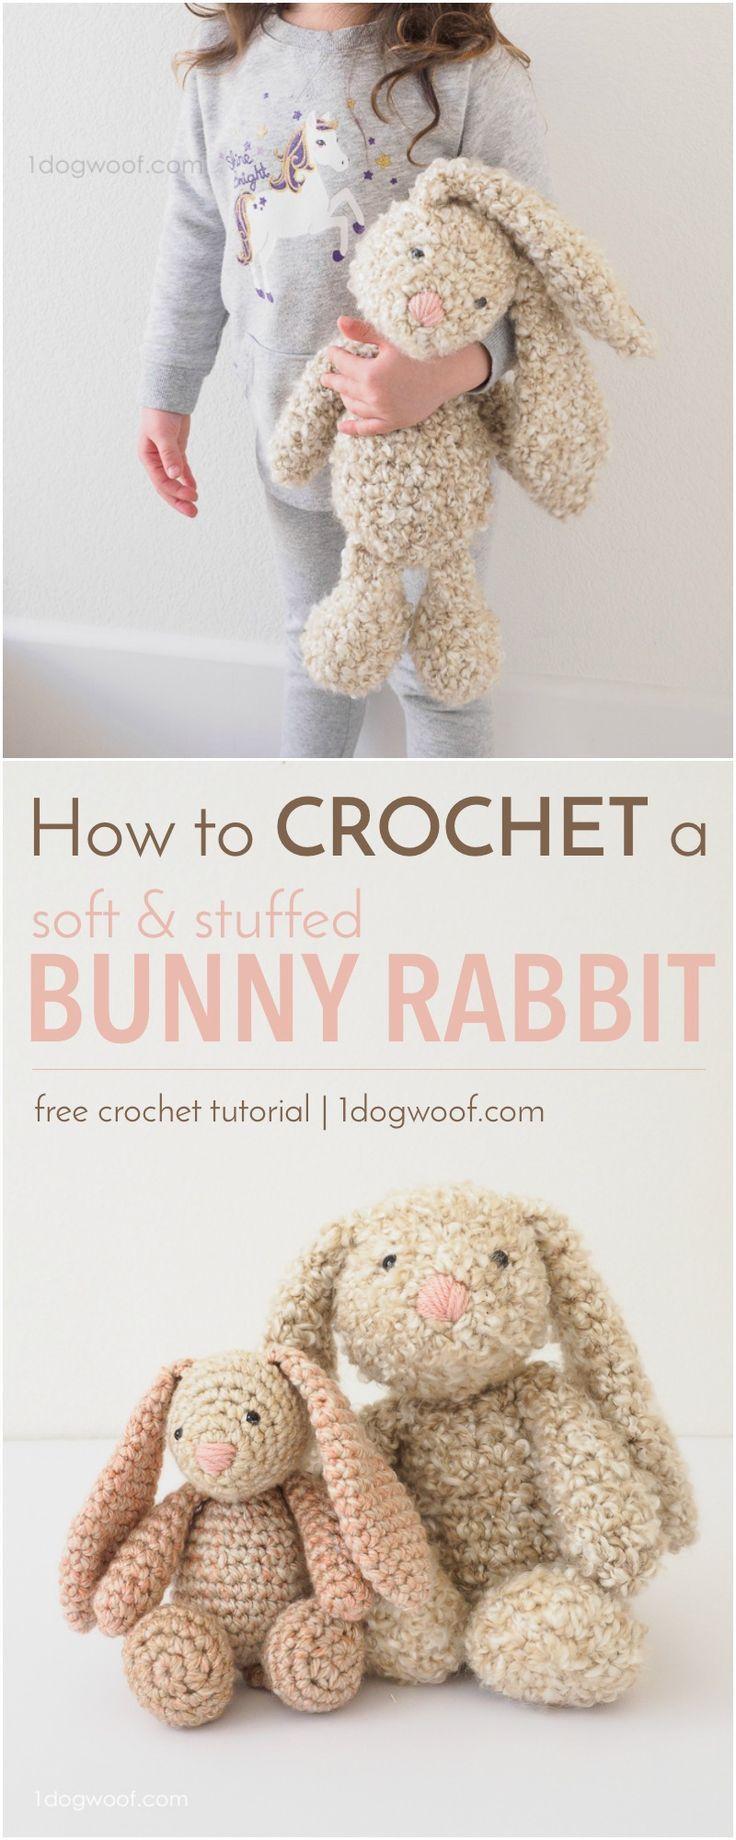 Classic Stuffed Bunny Crochet Pattern for Easter   Conejo, Tejido y ...